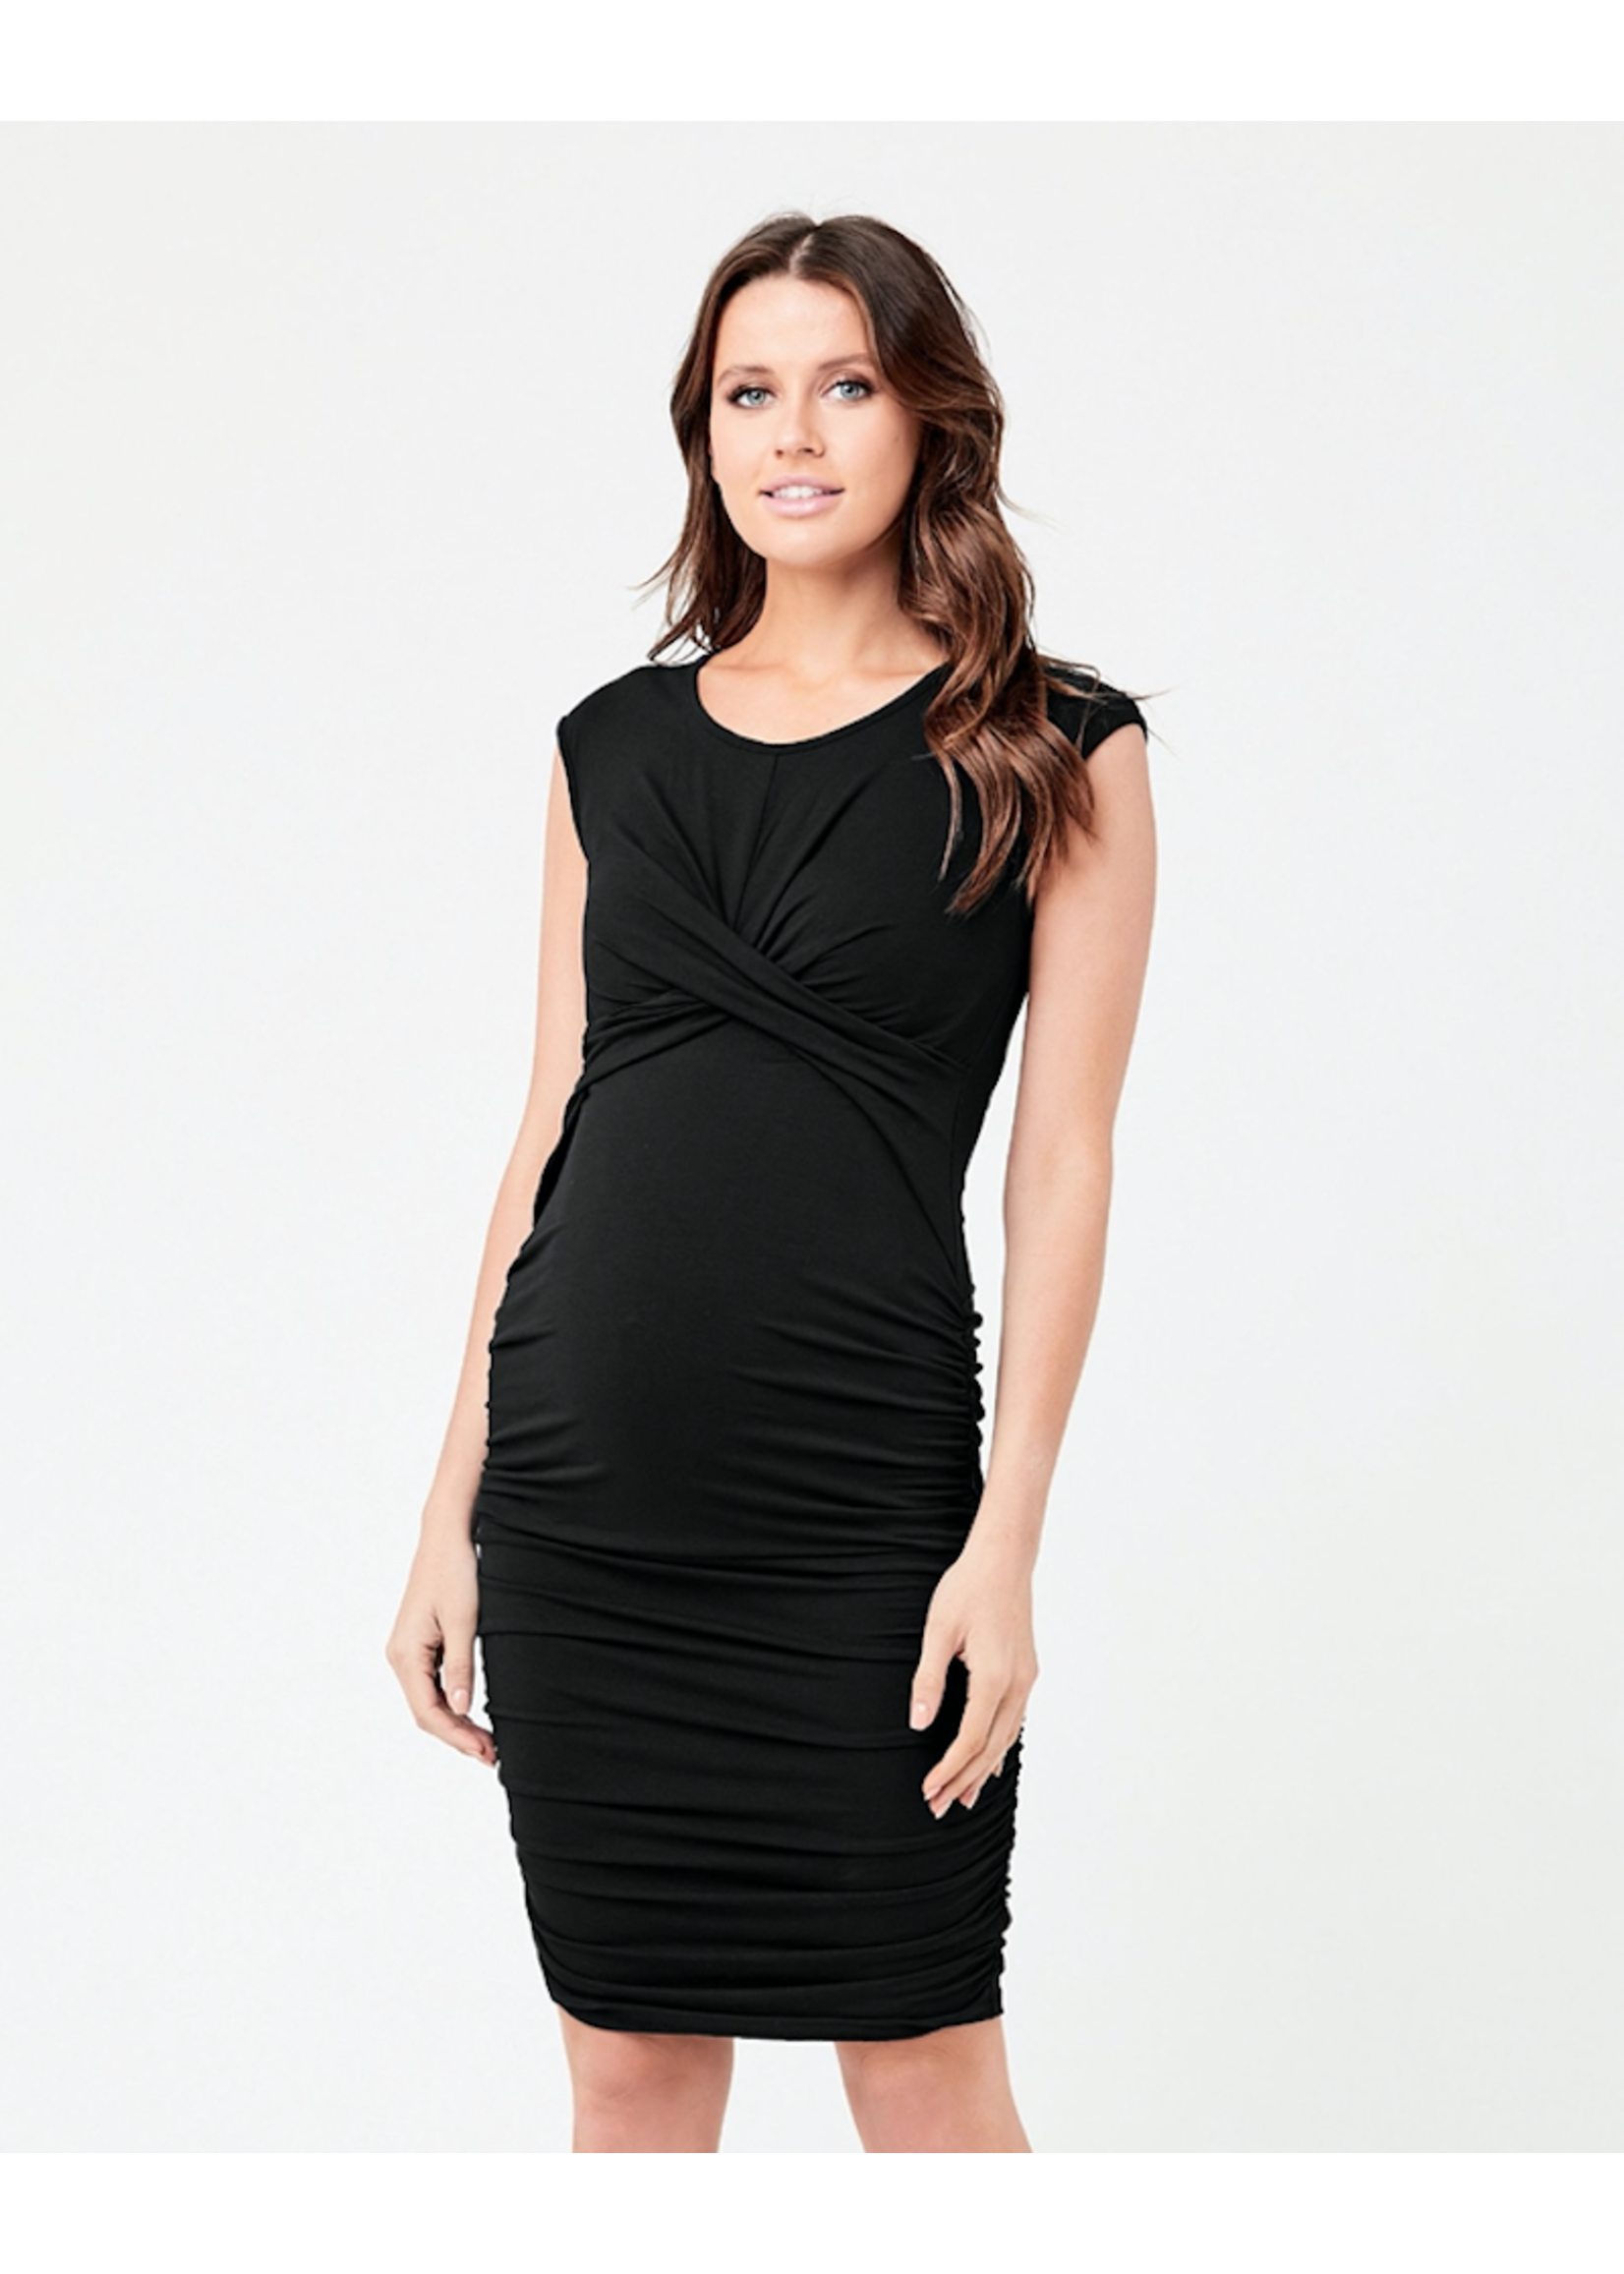 Ripe Maternity RIpe Maternity, Cross My Heart Dress, Black